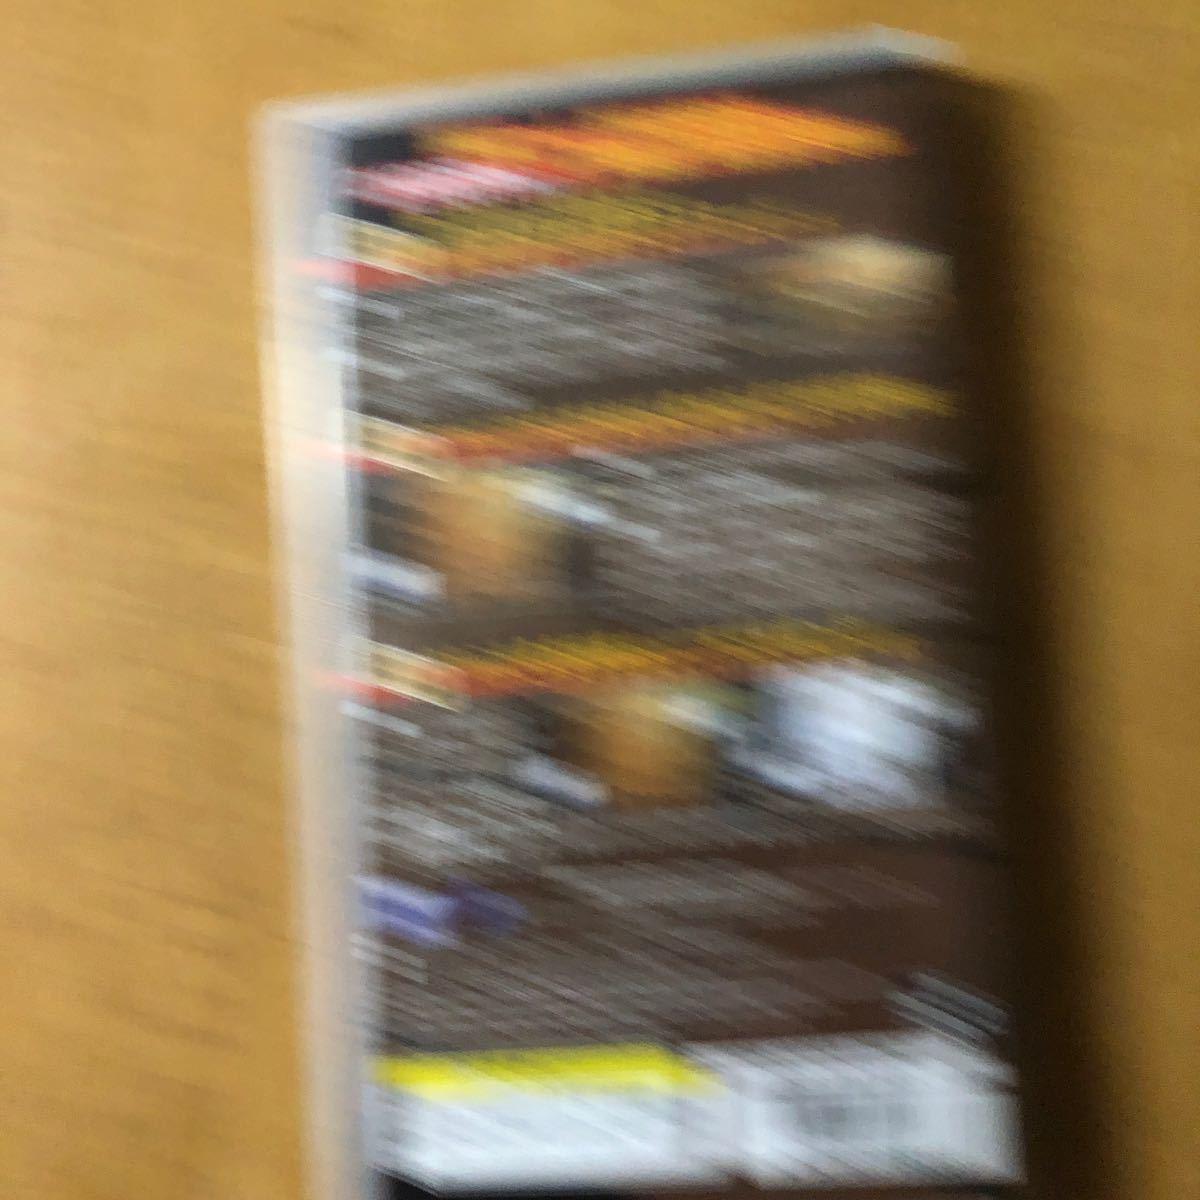 【PSP】 SIMPLE2000シリーズ Portable!! Vol.2 THE 将棋